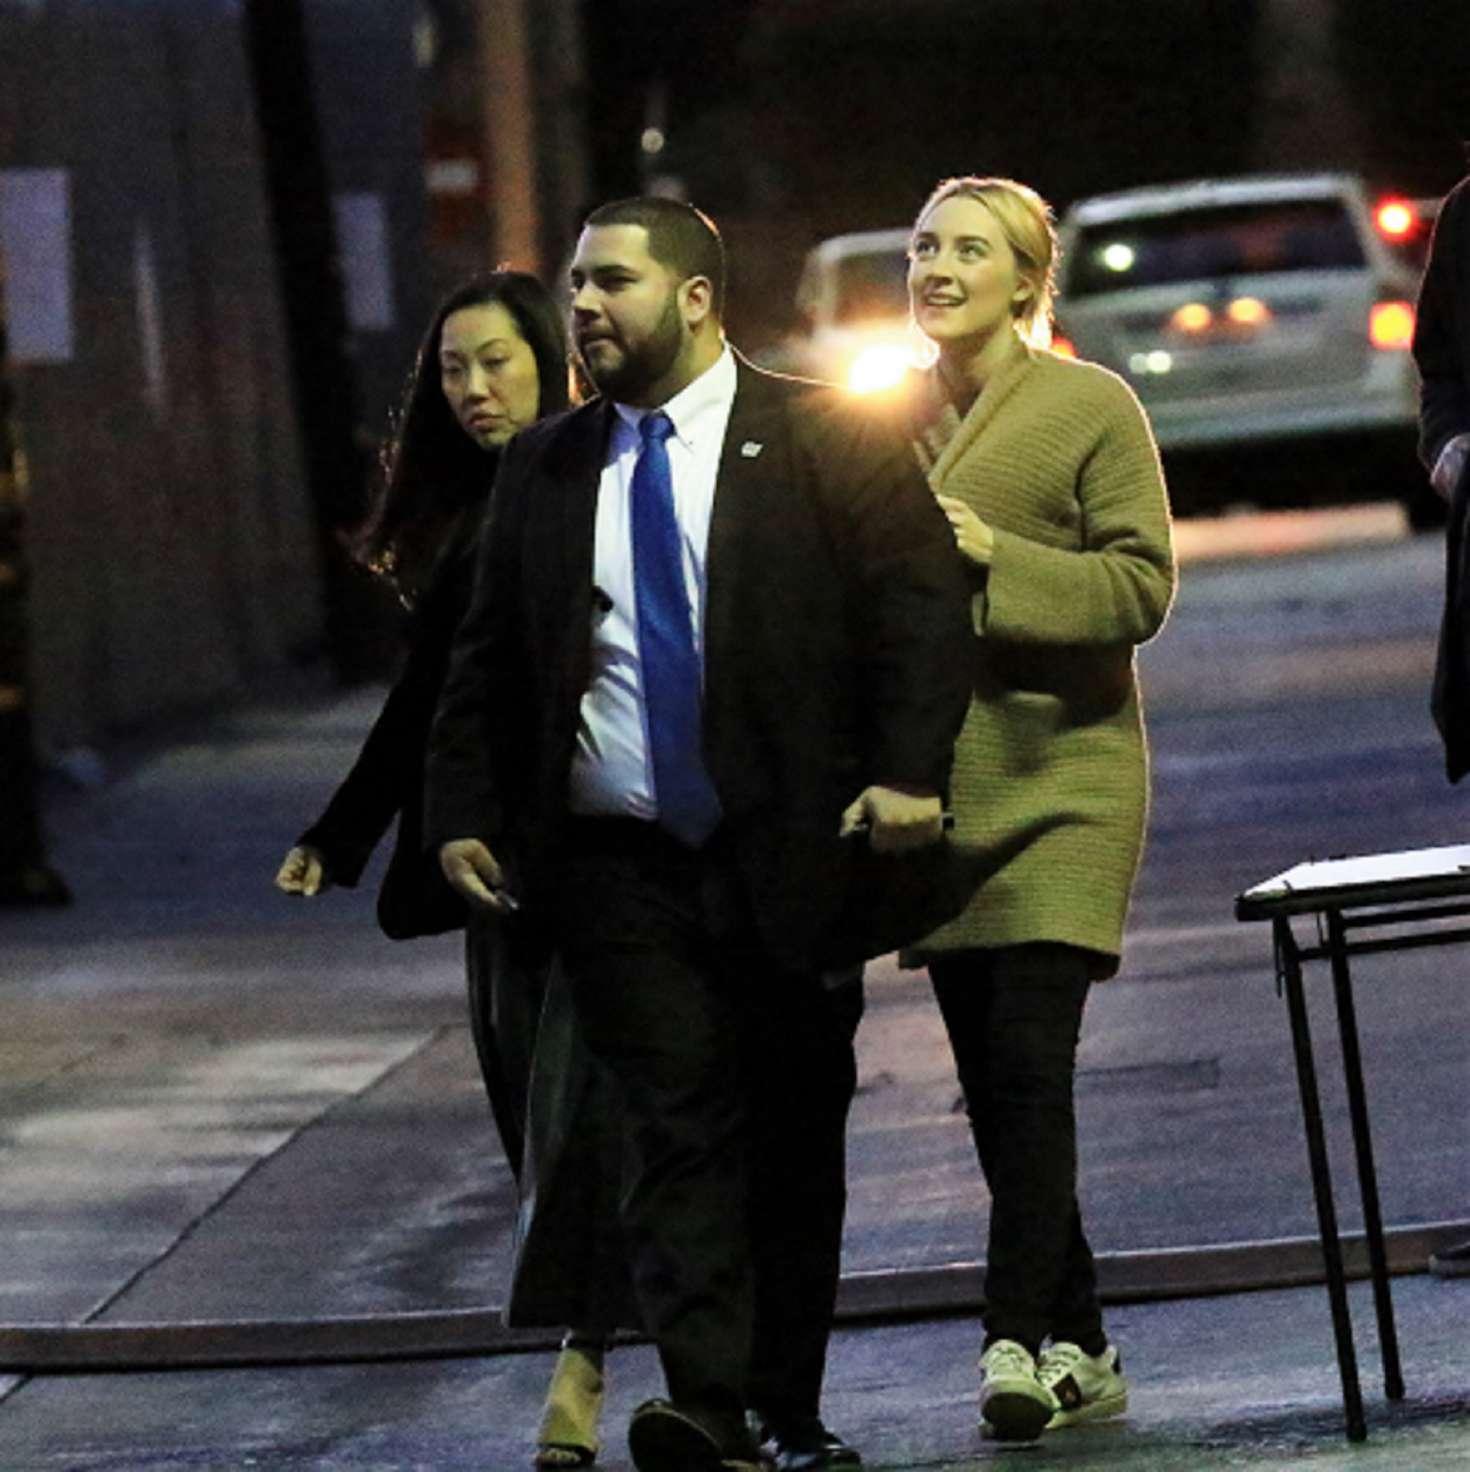 Saoirse Ronan 2018 : Saoirse Ronan: Arriving at Jimmy Kimmel Live -12